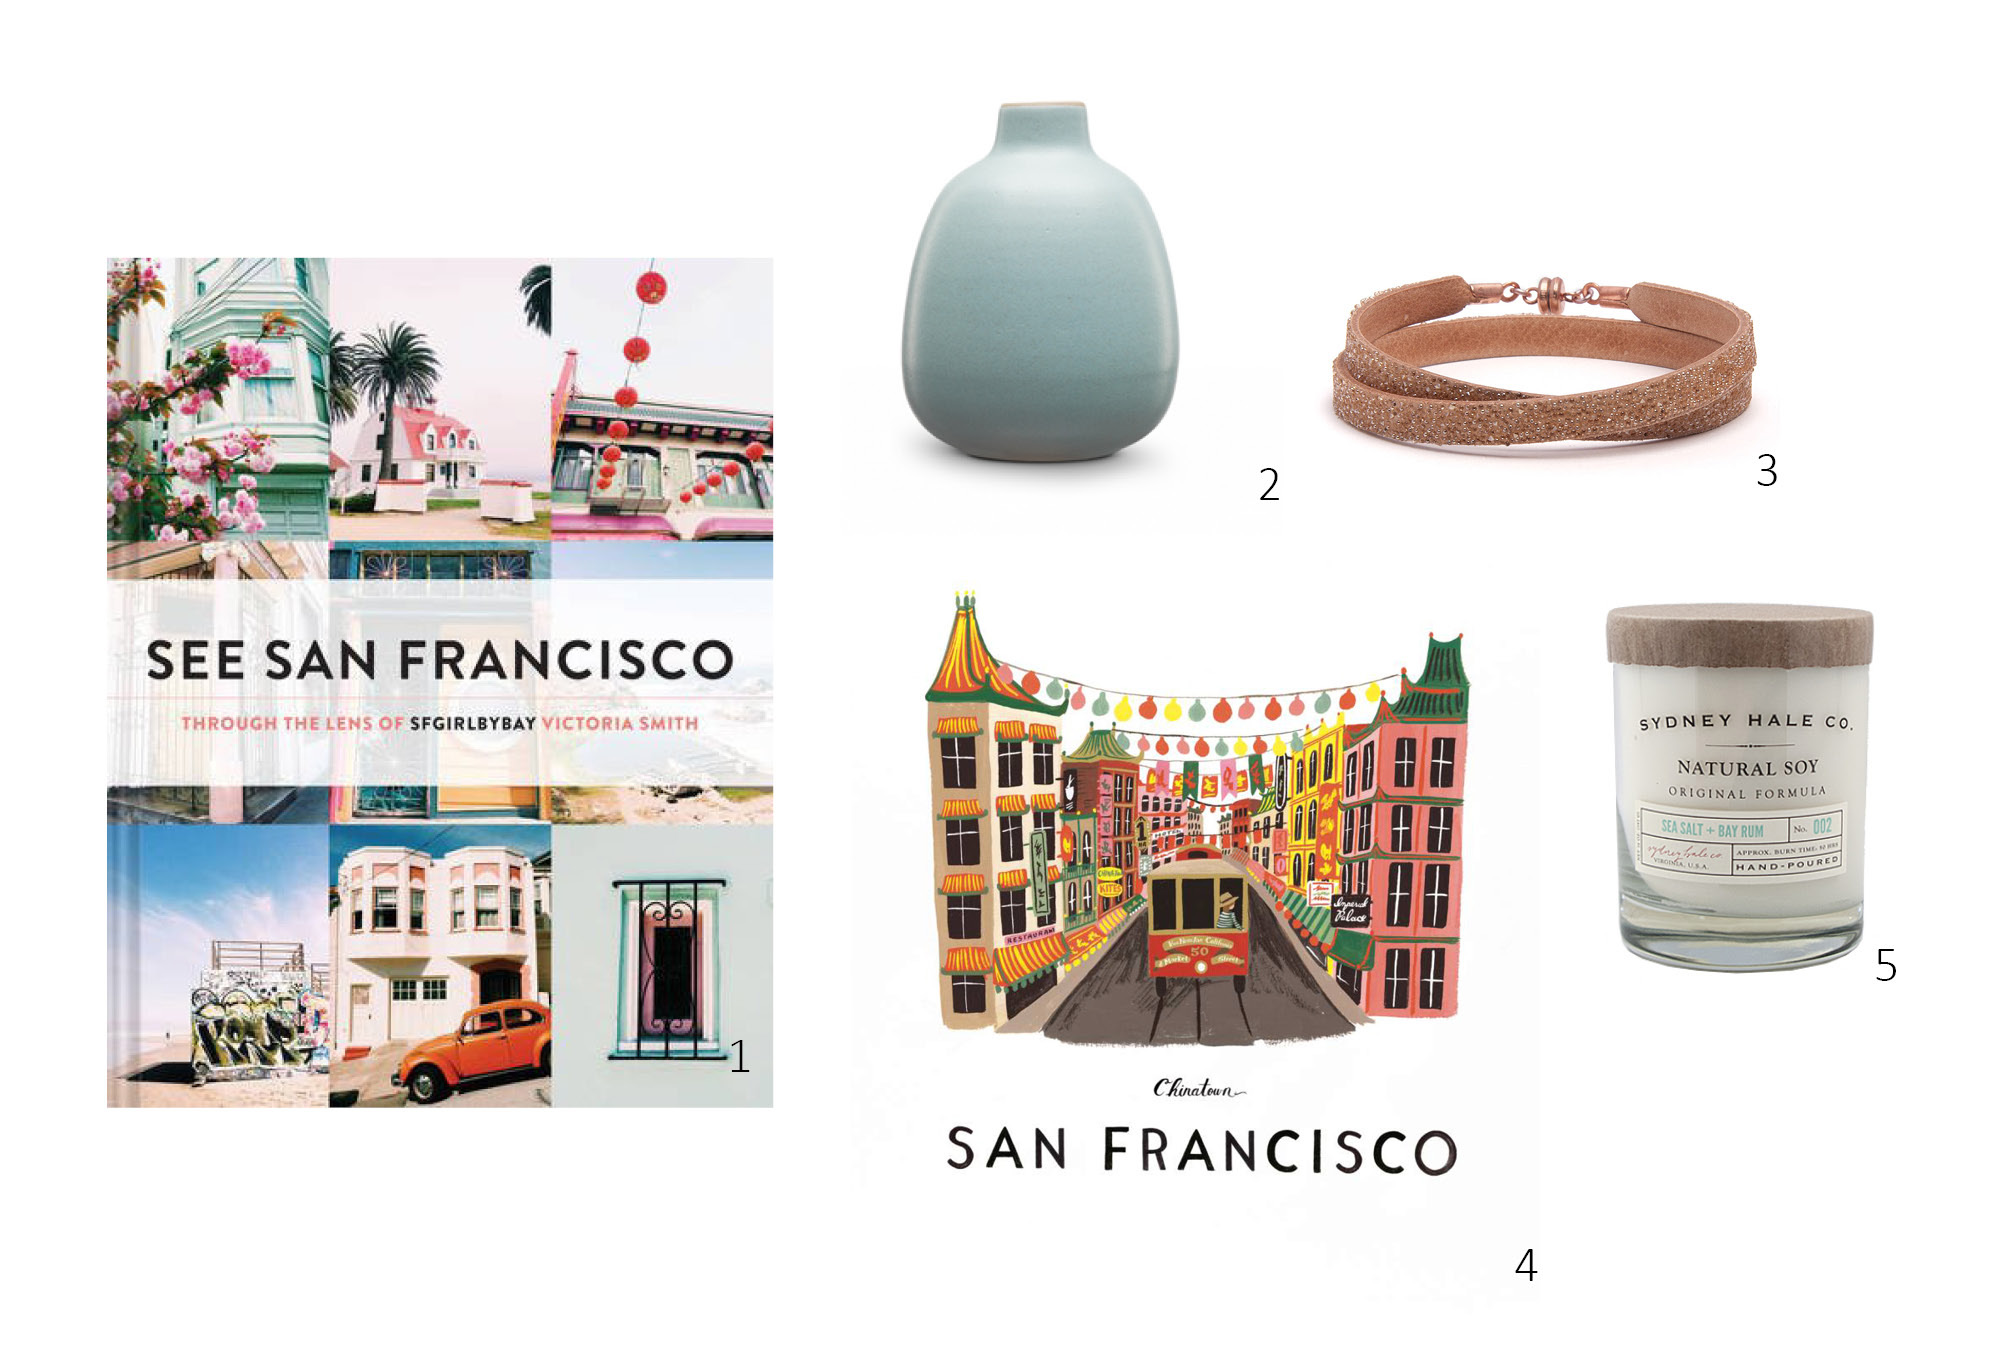 1.  See San Francisco by SFGirlByBay $12.55 ;2.  Heath Ceramics bud vase $24 ;3.  Sherise Double Wrap $50 ;4.Rifle Paper Company San Francisco art print $40; 5. Sydney Hale Sea Salt and Bay Rum Candle $30